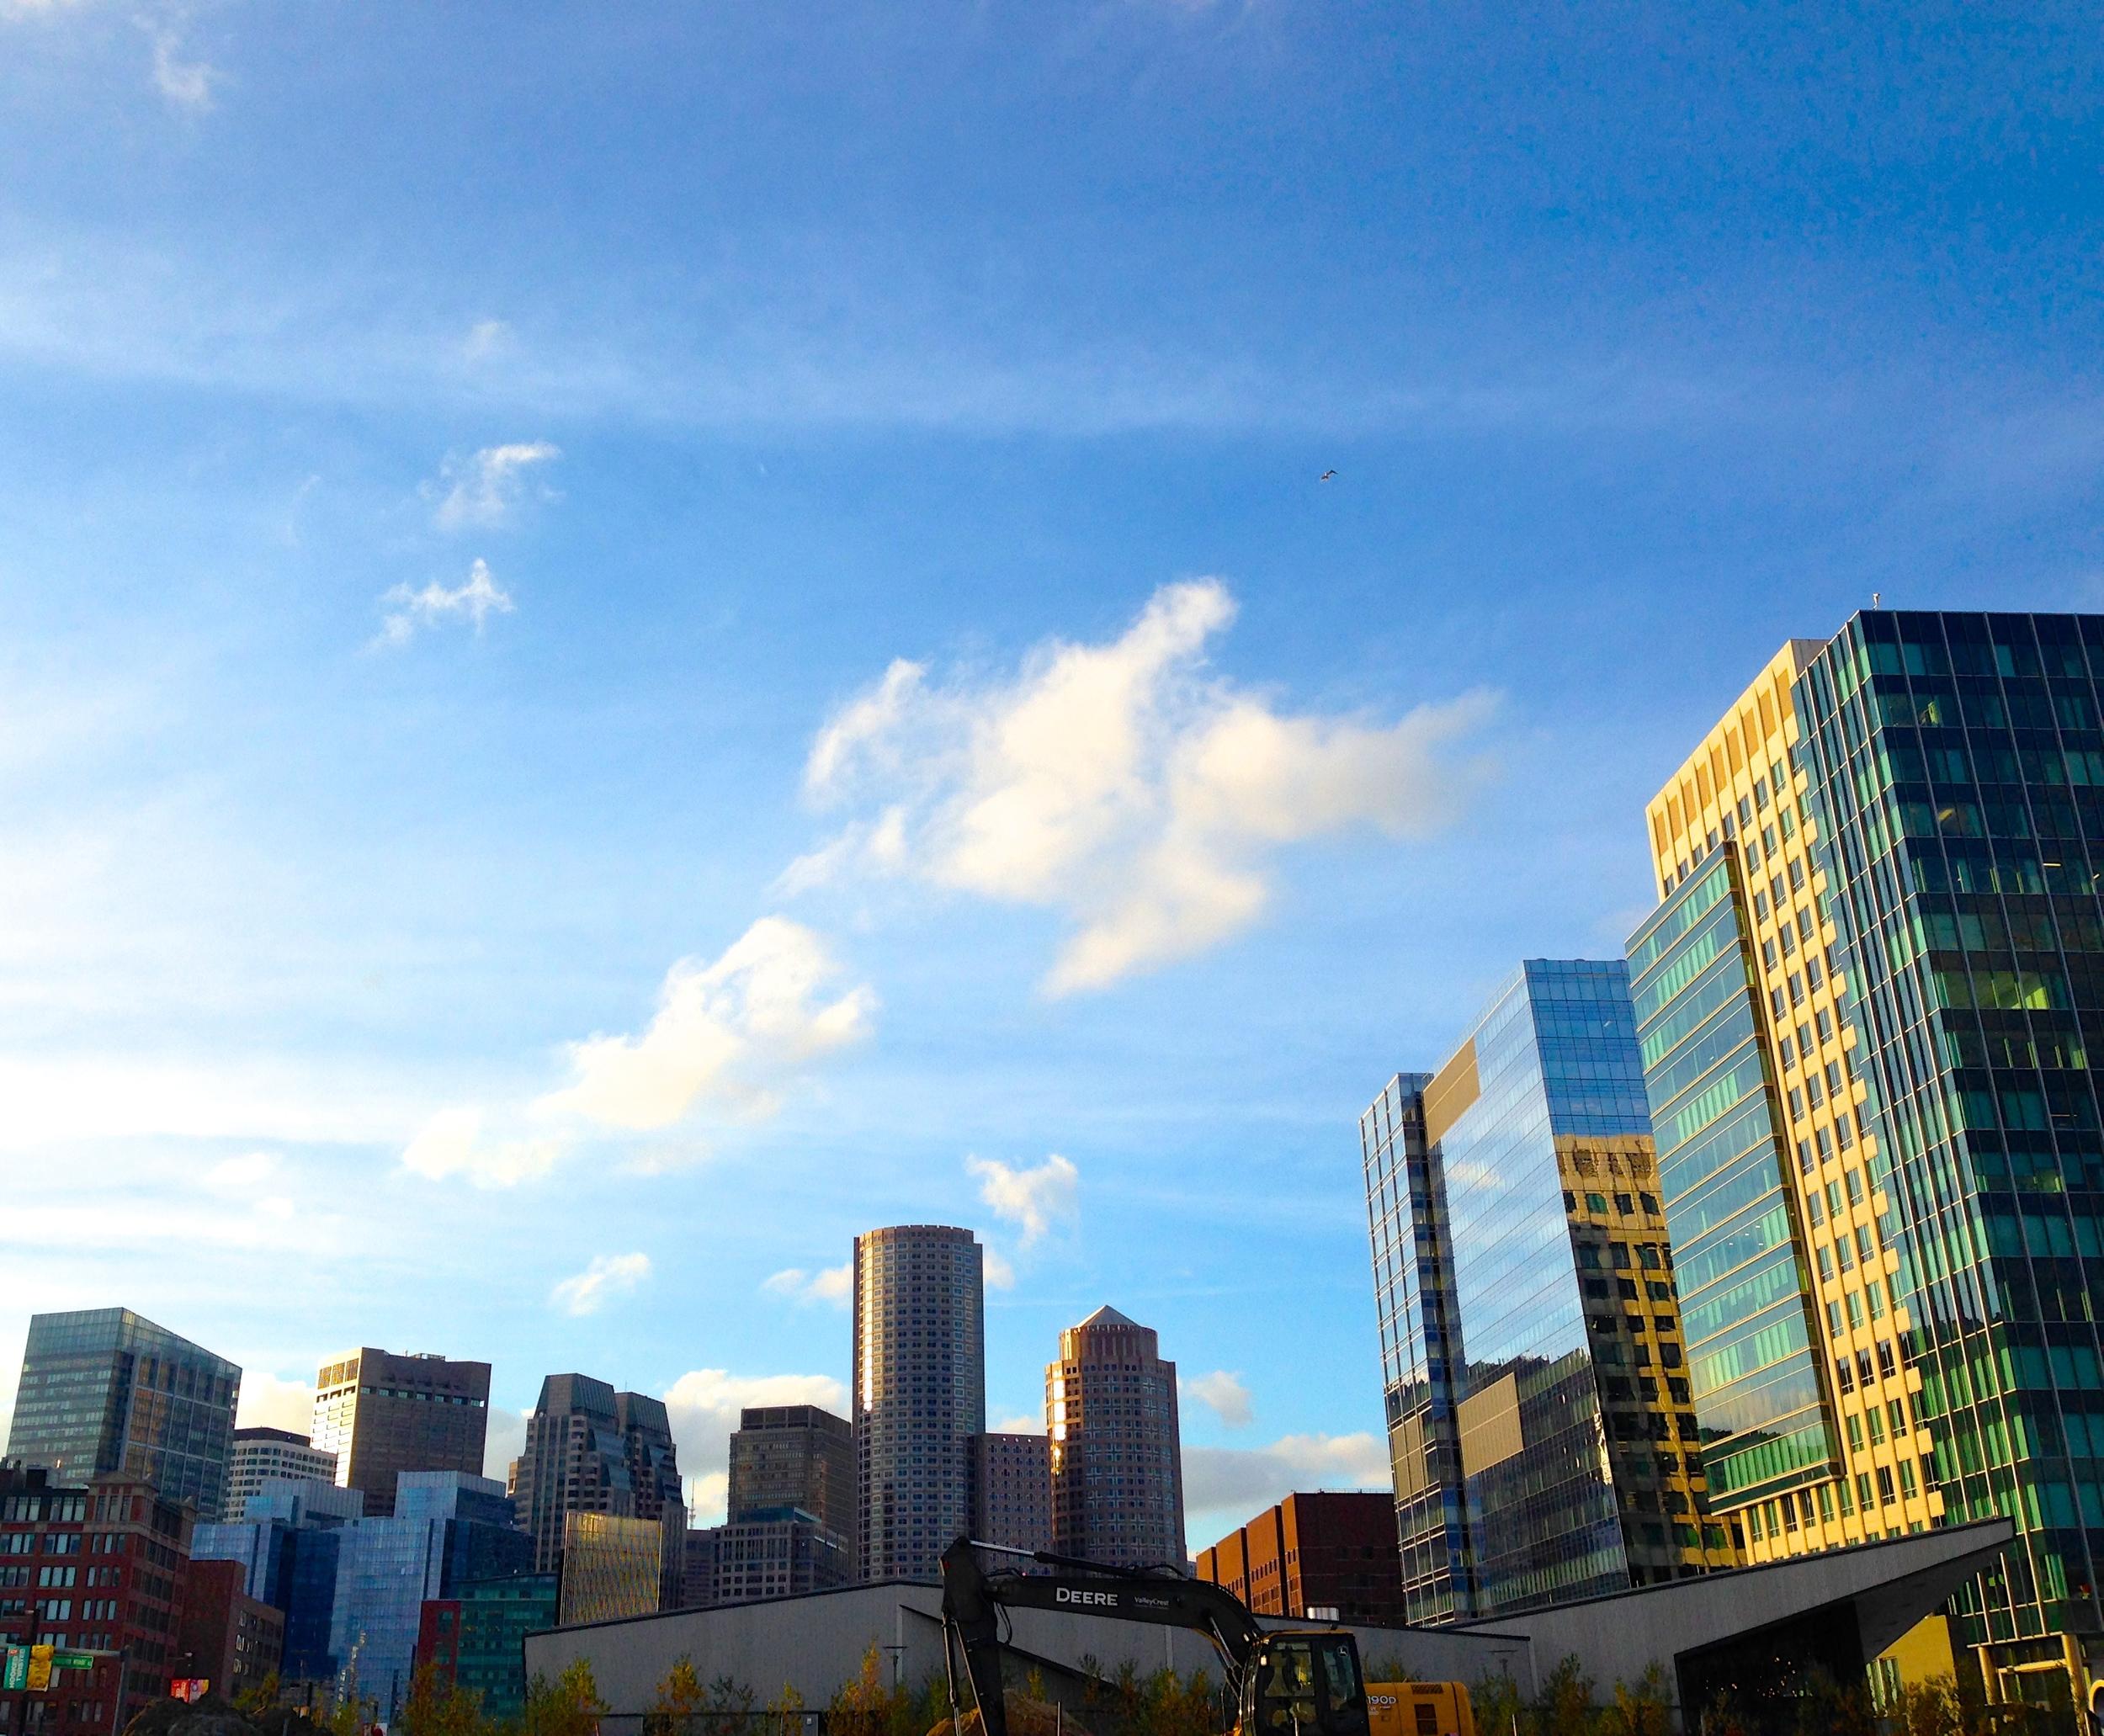 {A beautiful fall walkdown by the seaport in Boston}